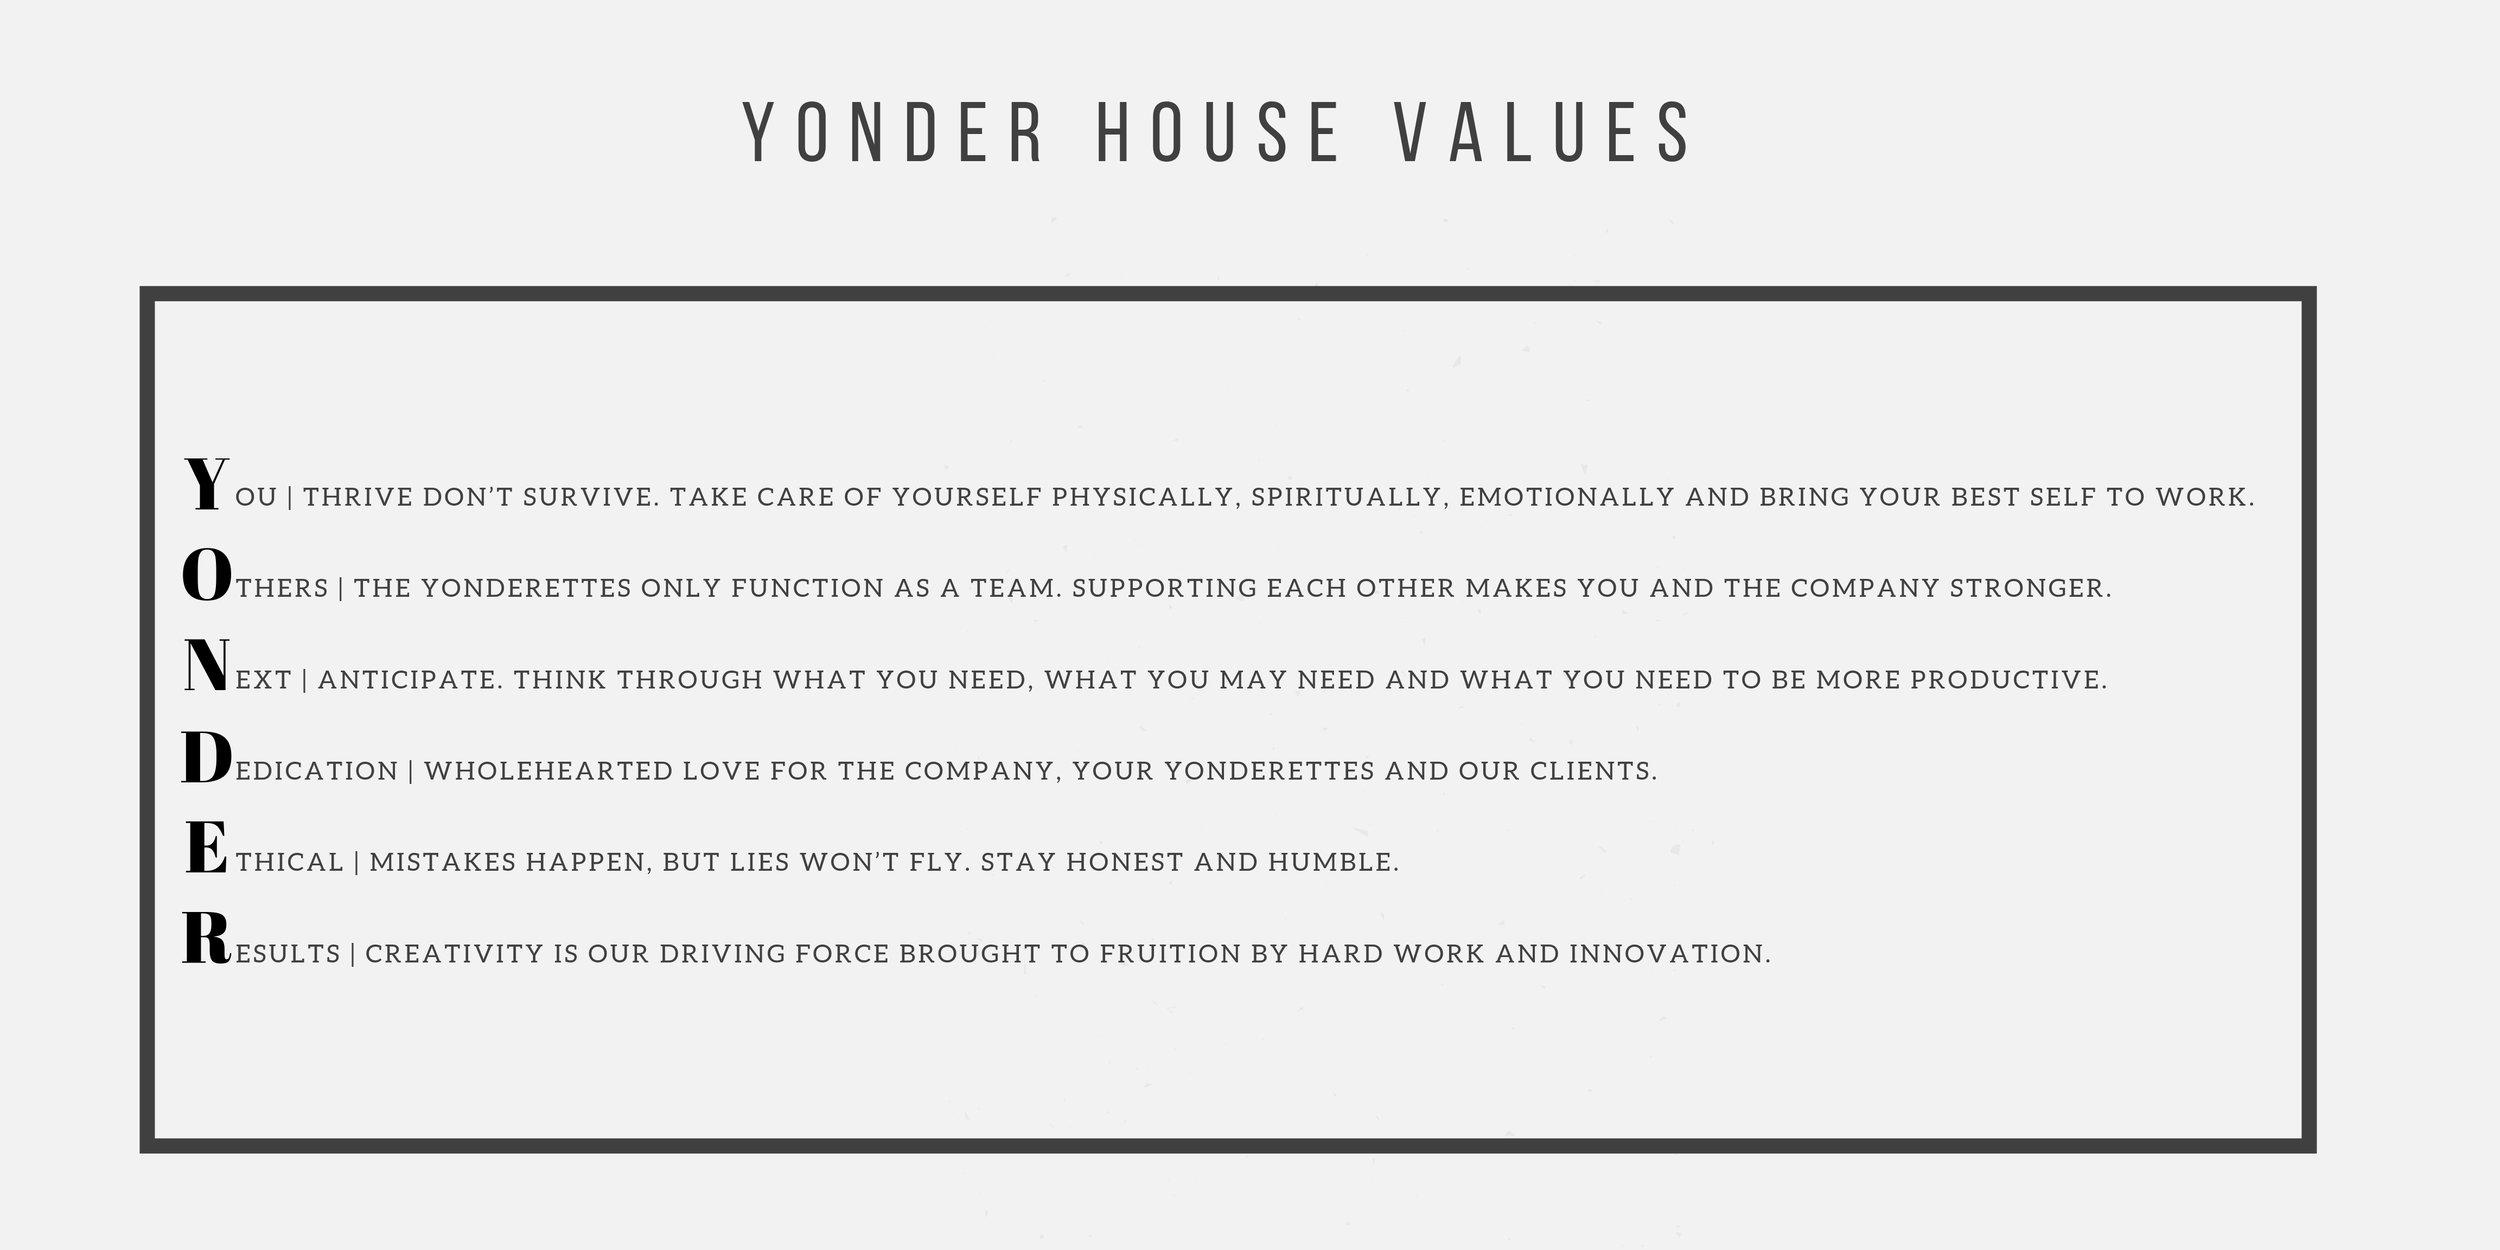 Yonder House Values.jpg